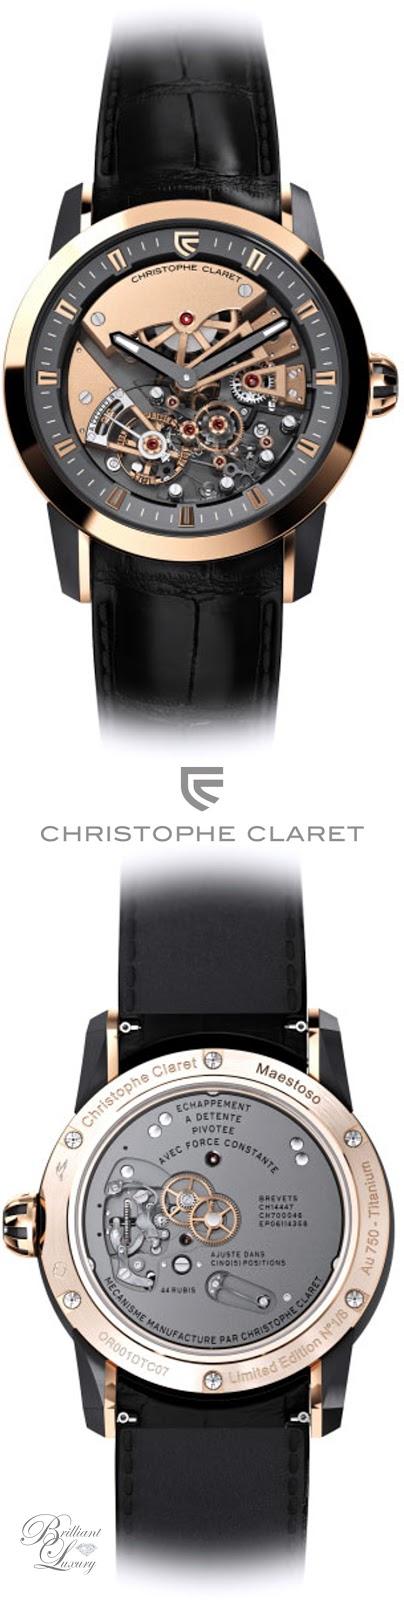 Brilliant Luxury ♦ Christophe Claret Maestoso Watch Men